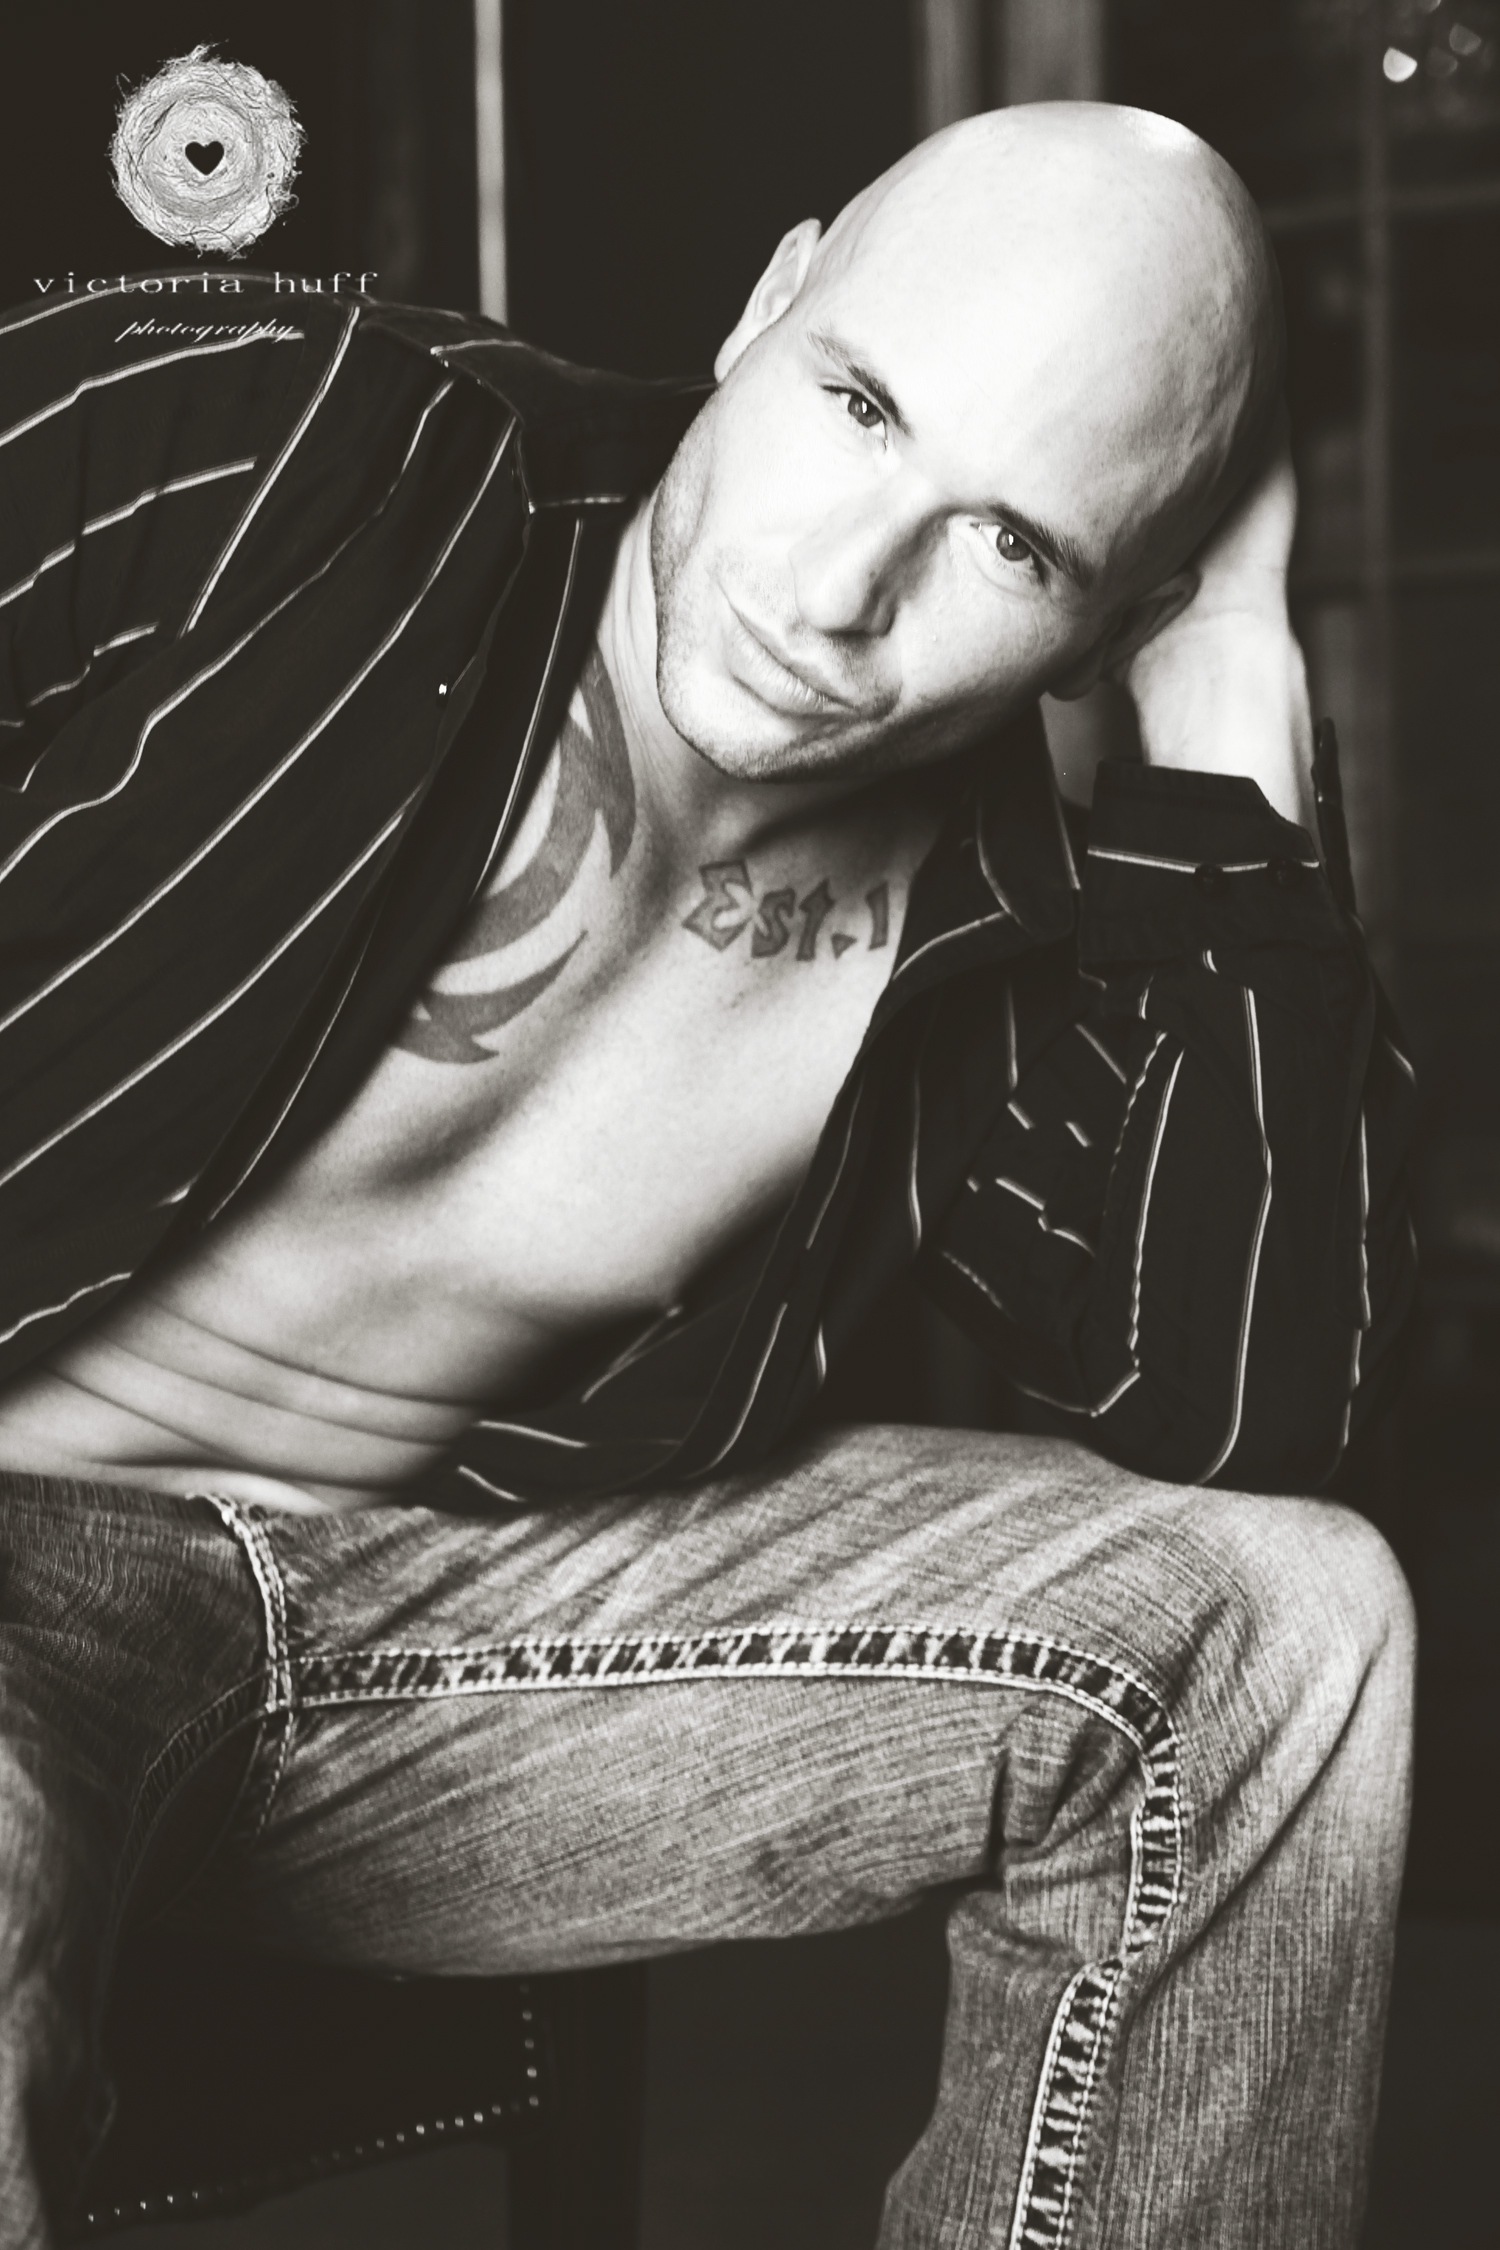 Jay-Urioste-Male-Model-Fashion-Nashville-Photography-Black-and-White-096.jpg